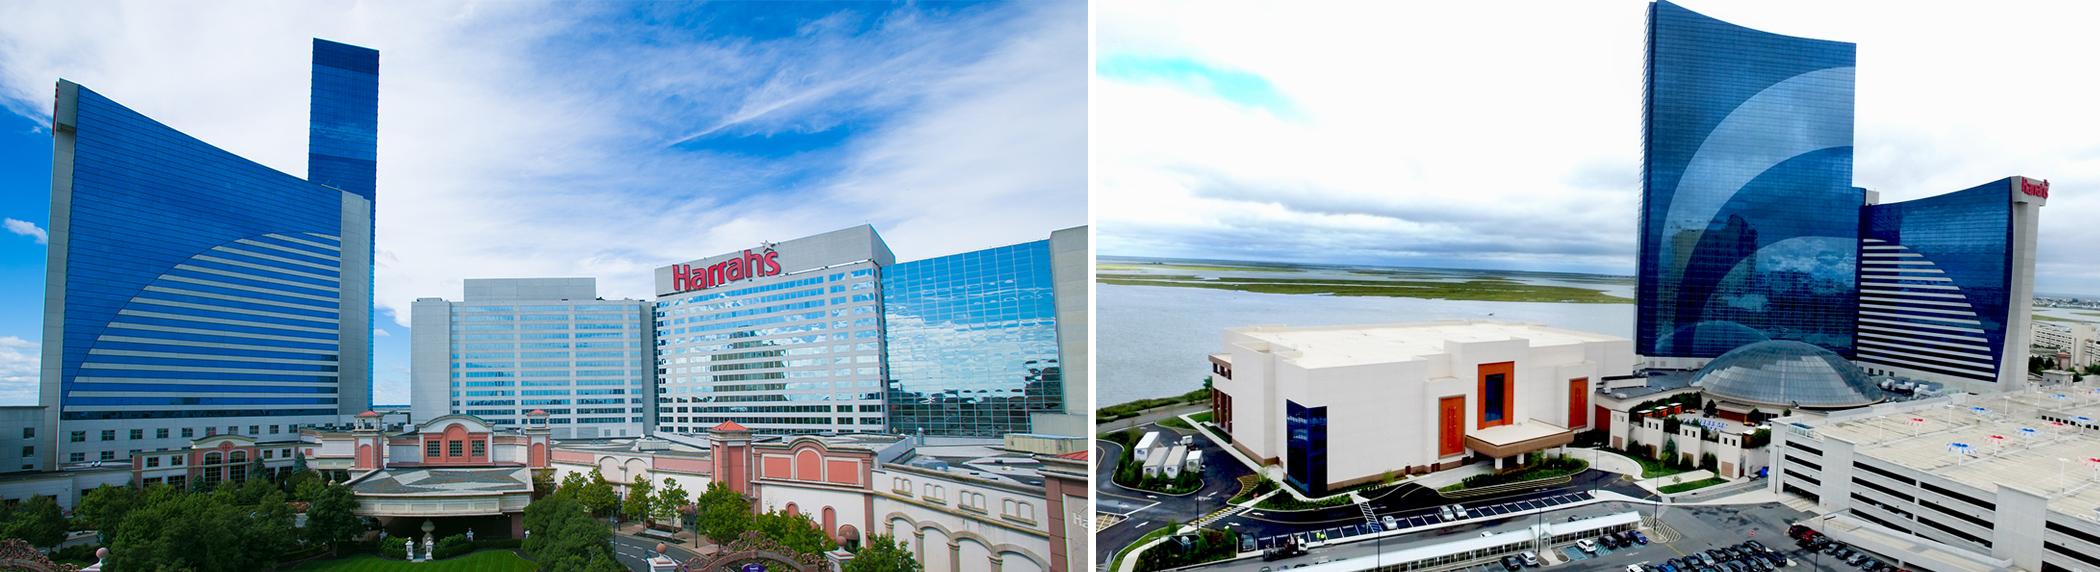 Casinos in Atlantic City, NJ